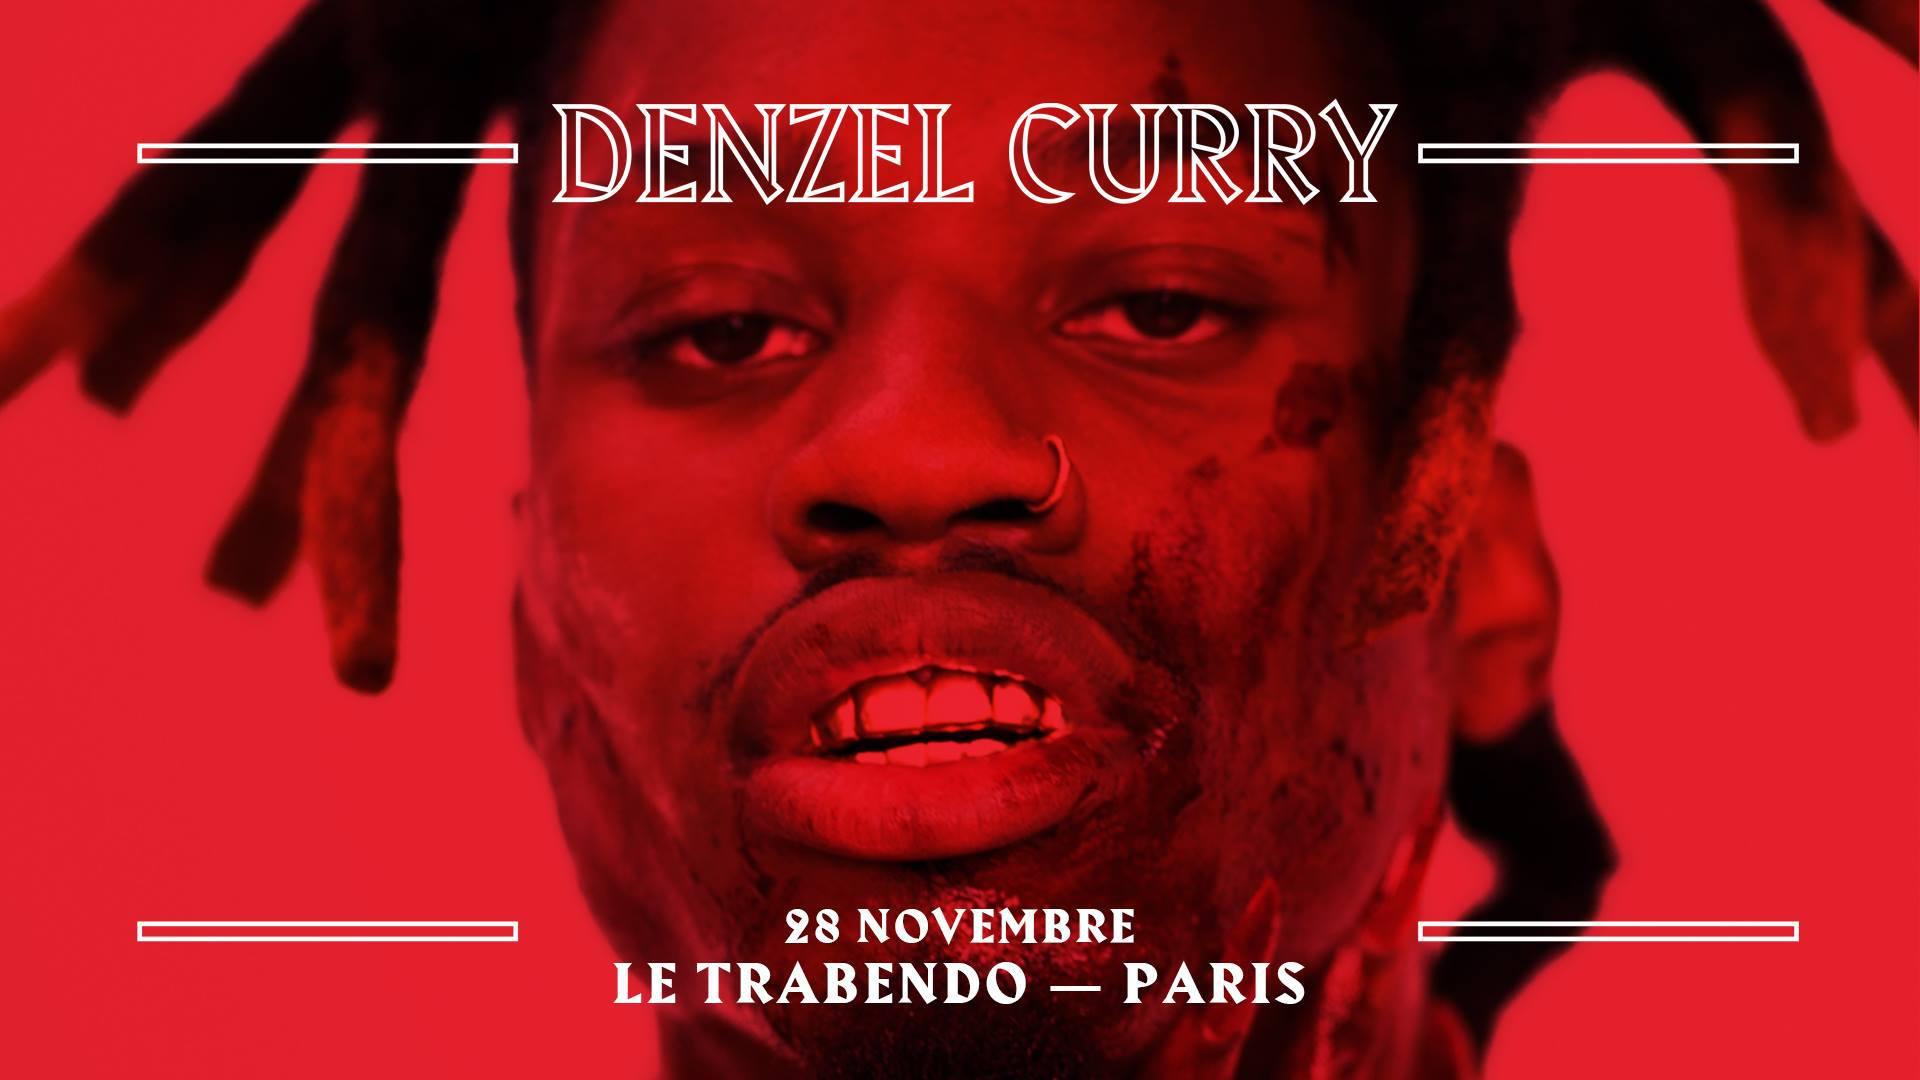 Denzel-Curry-—-Le-Trabendo.jpg